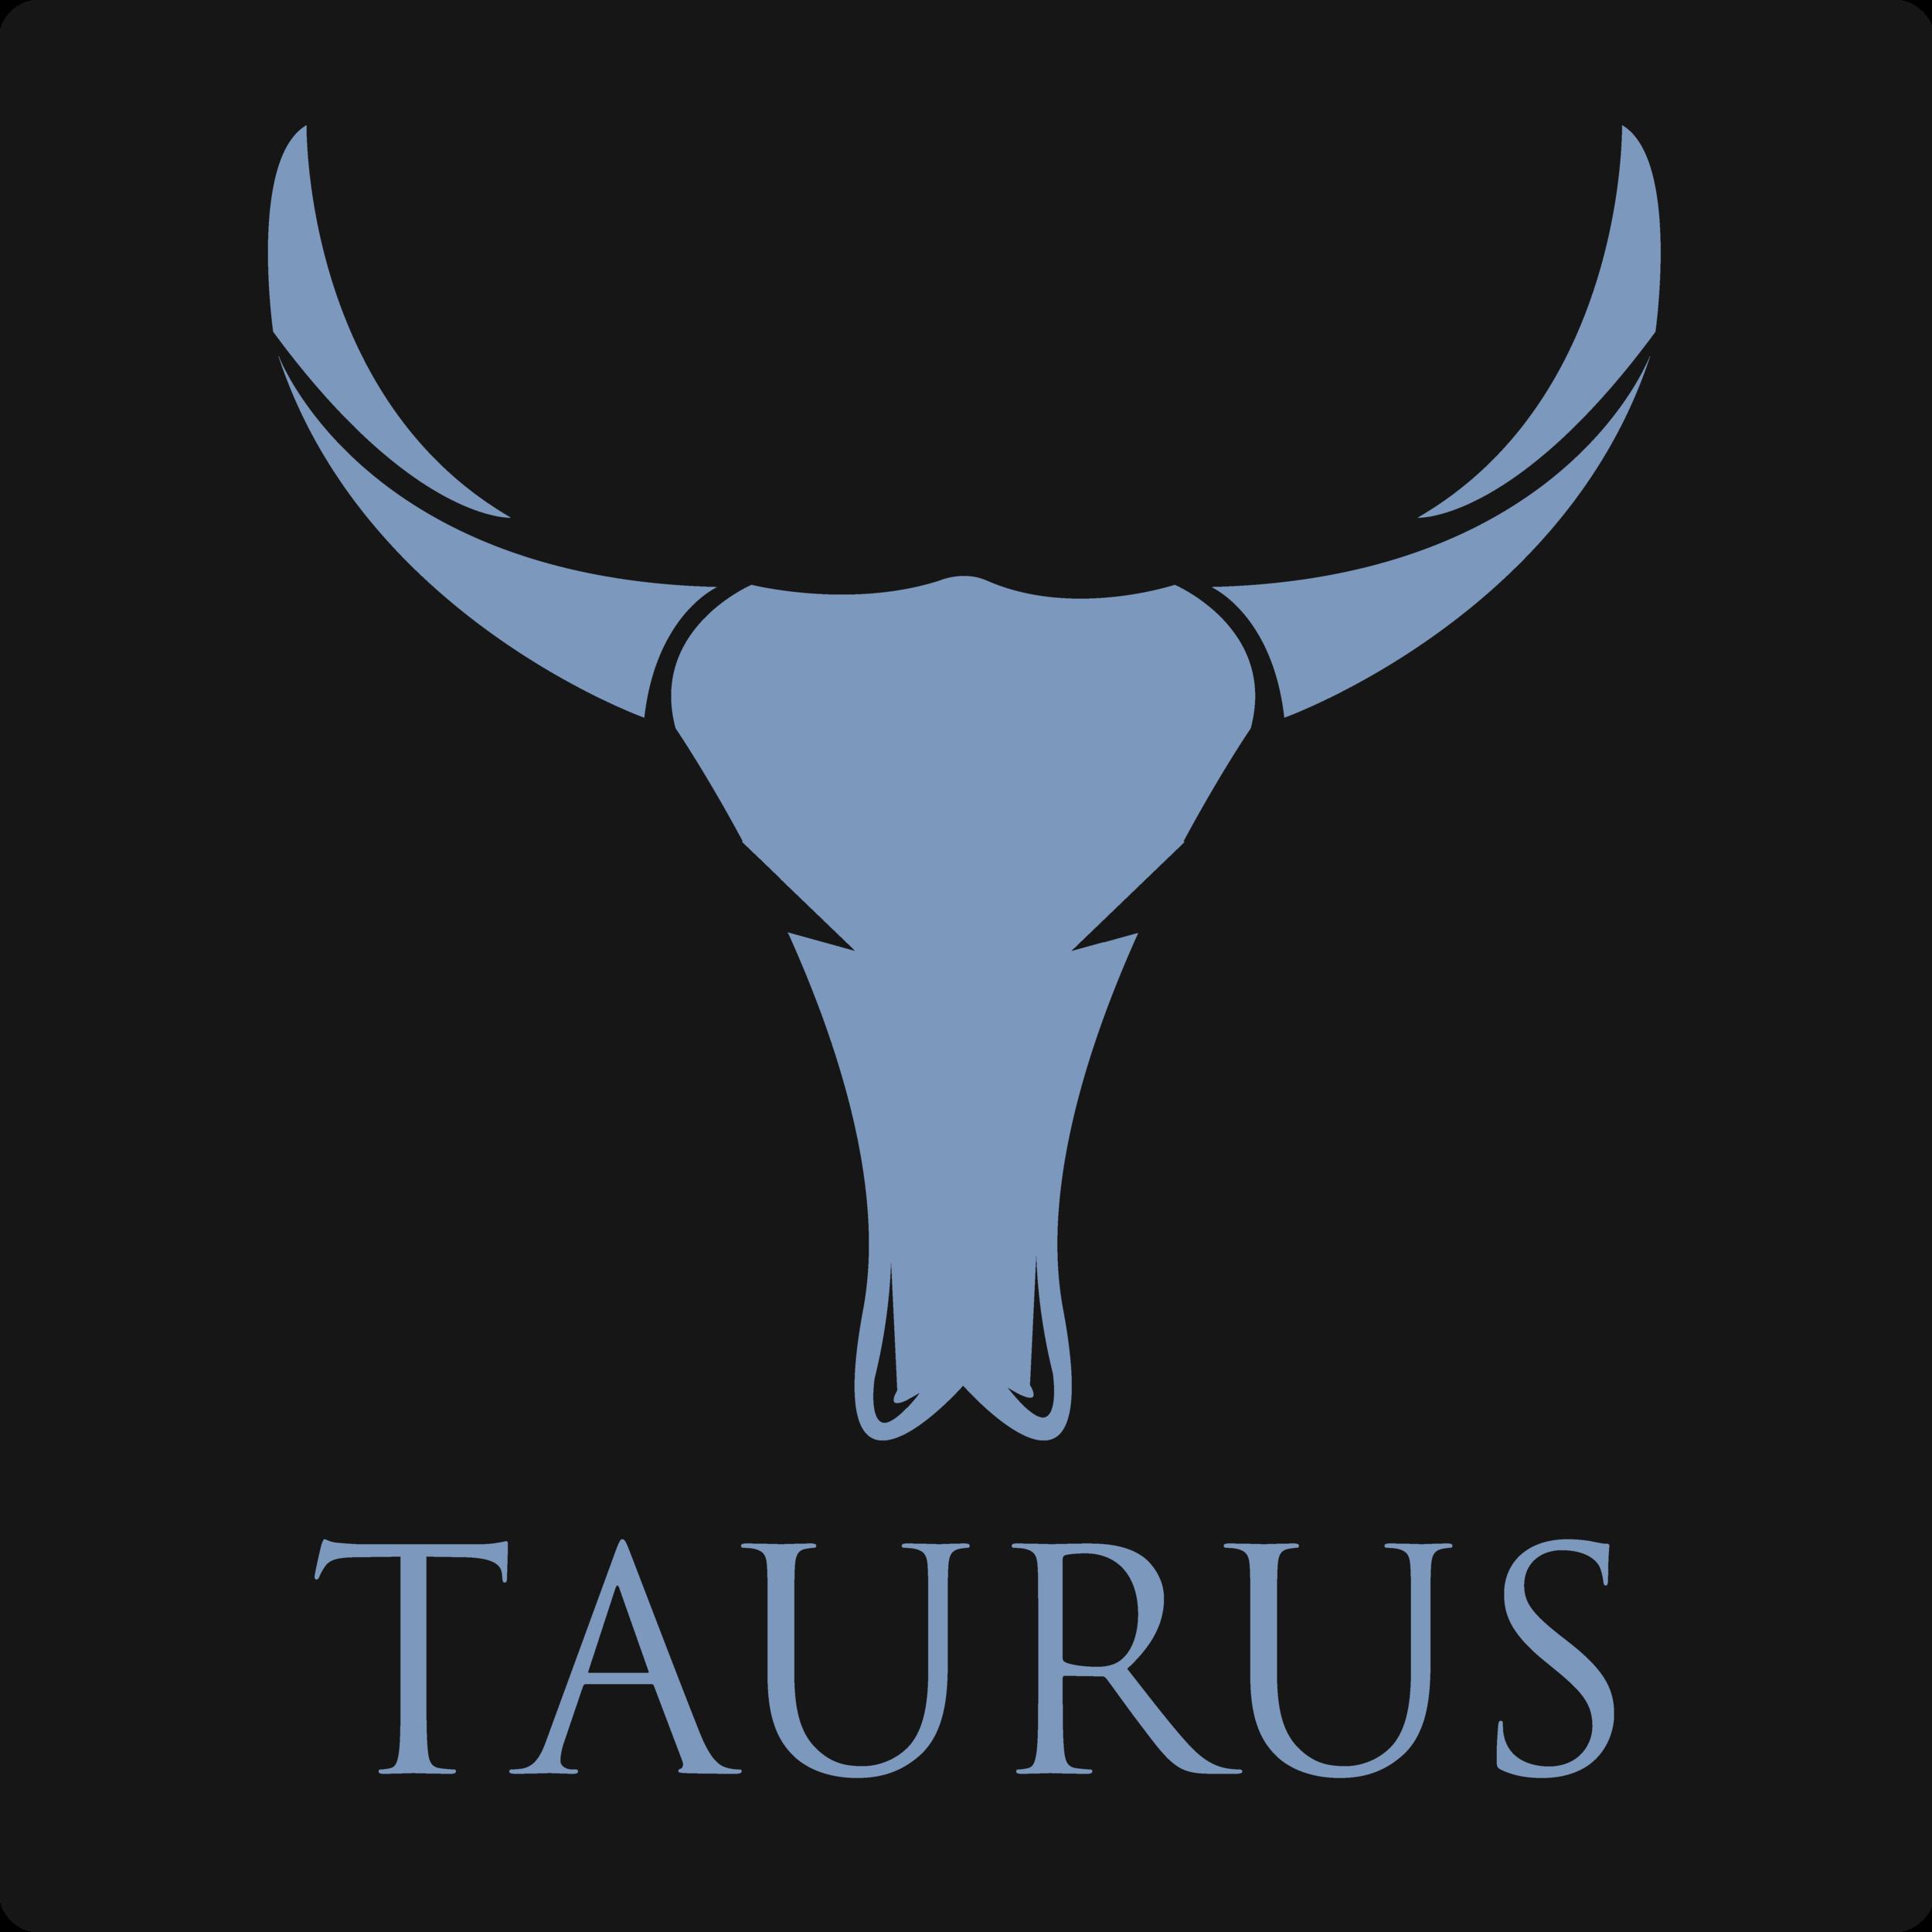 Taurus Vector.png